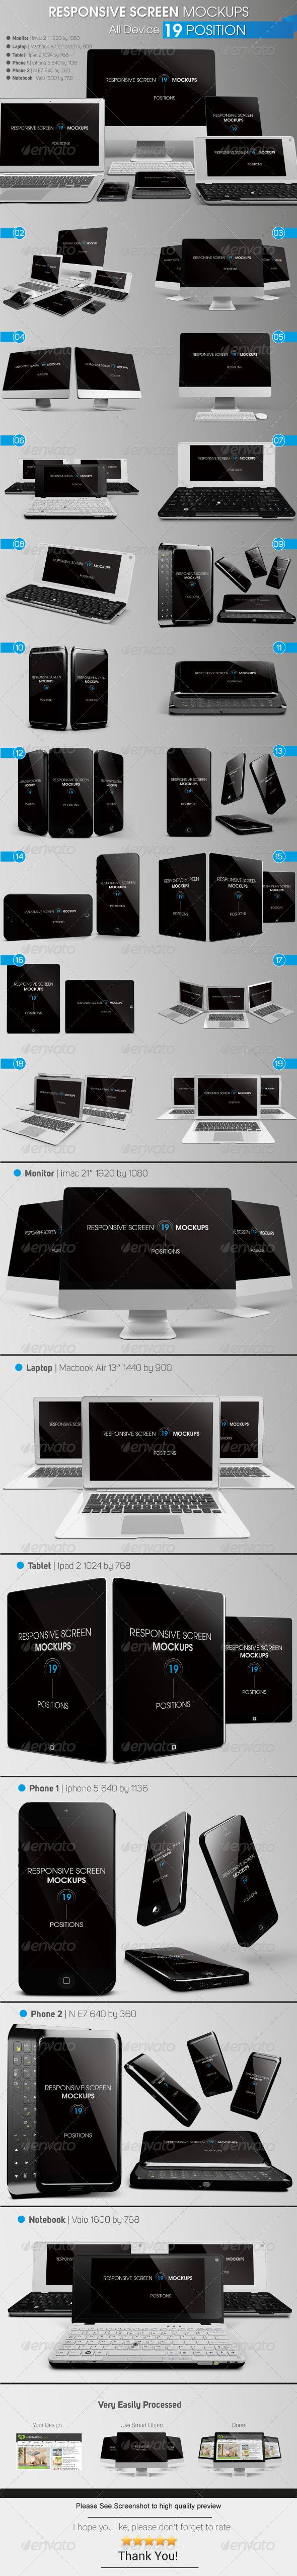 Responsive Screen Mockups - Multiple Displays